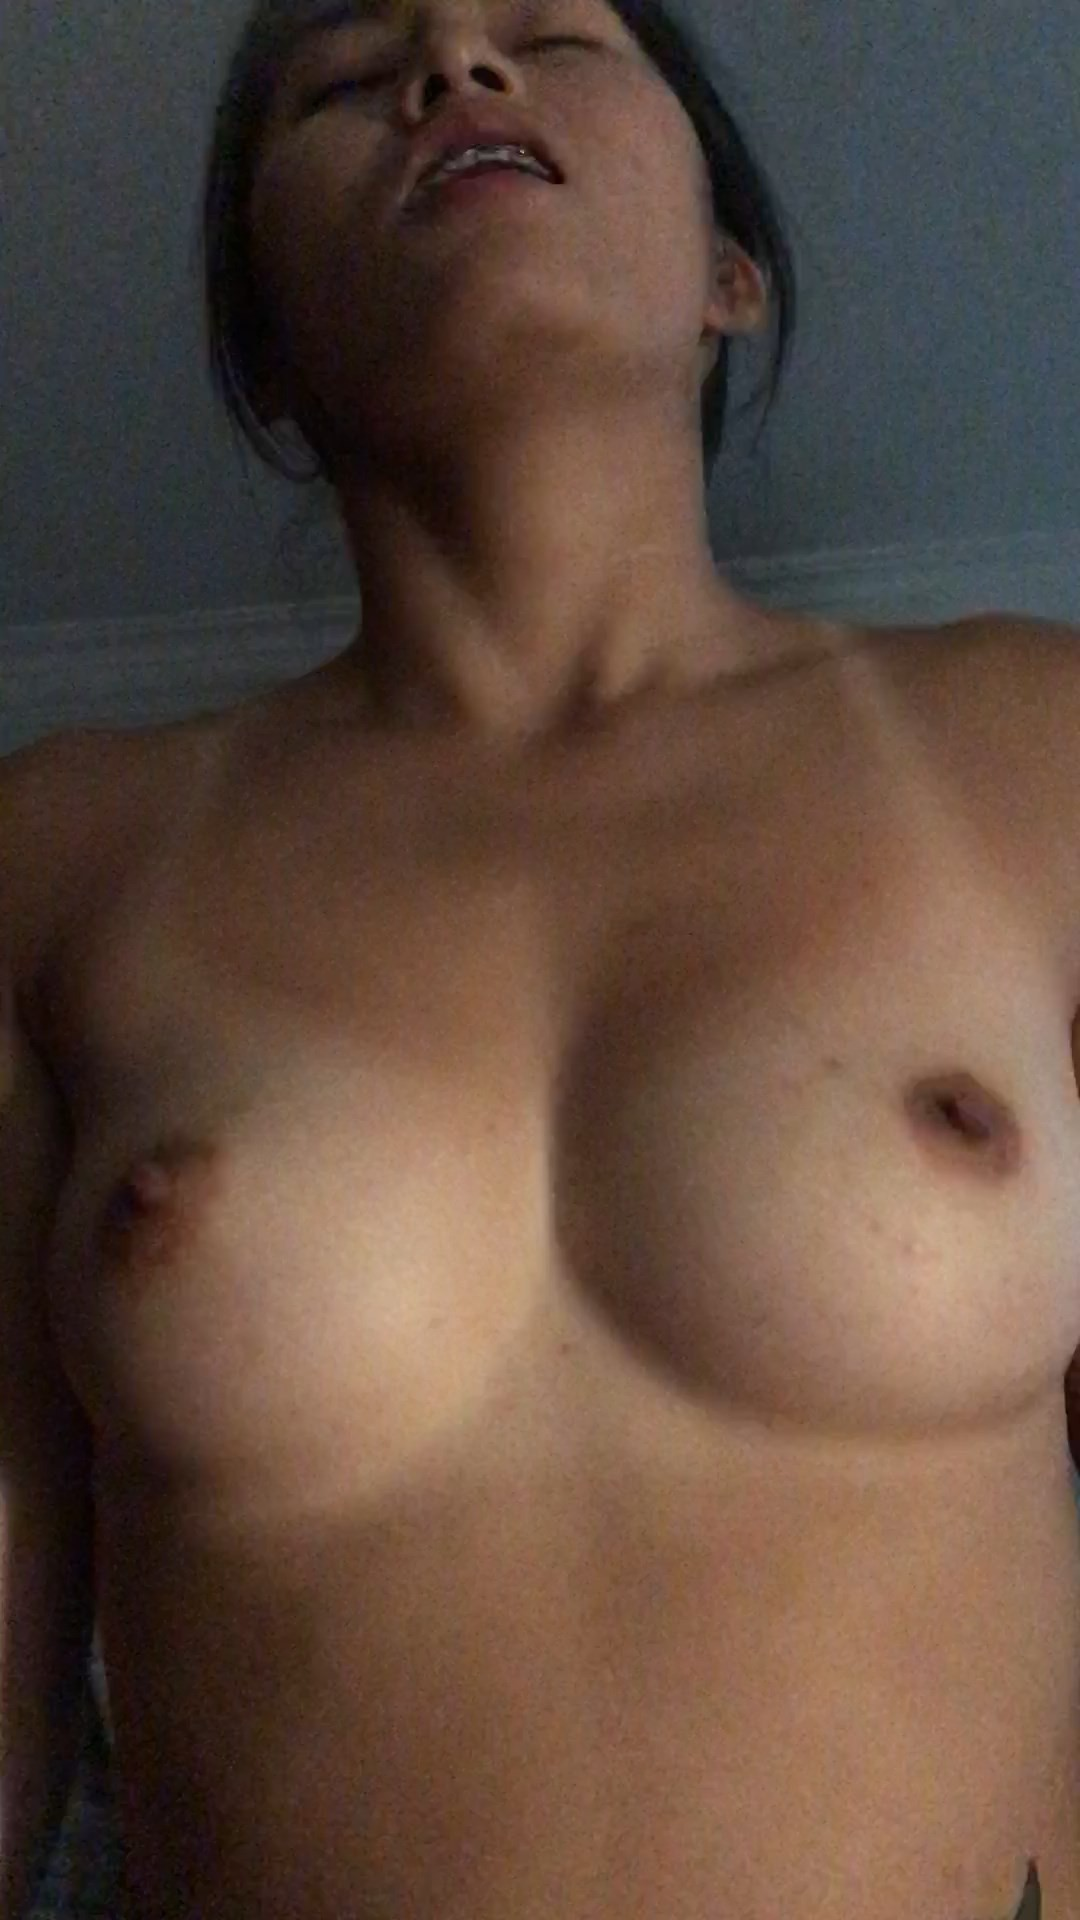 Xuenyenyenyen Leaked Nudes, Sex Pics